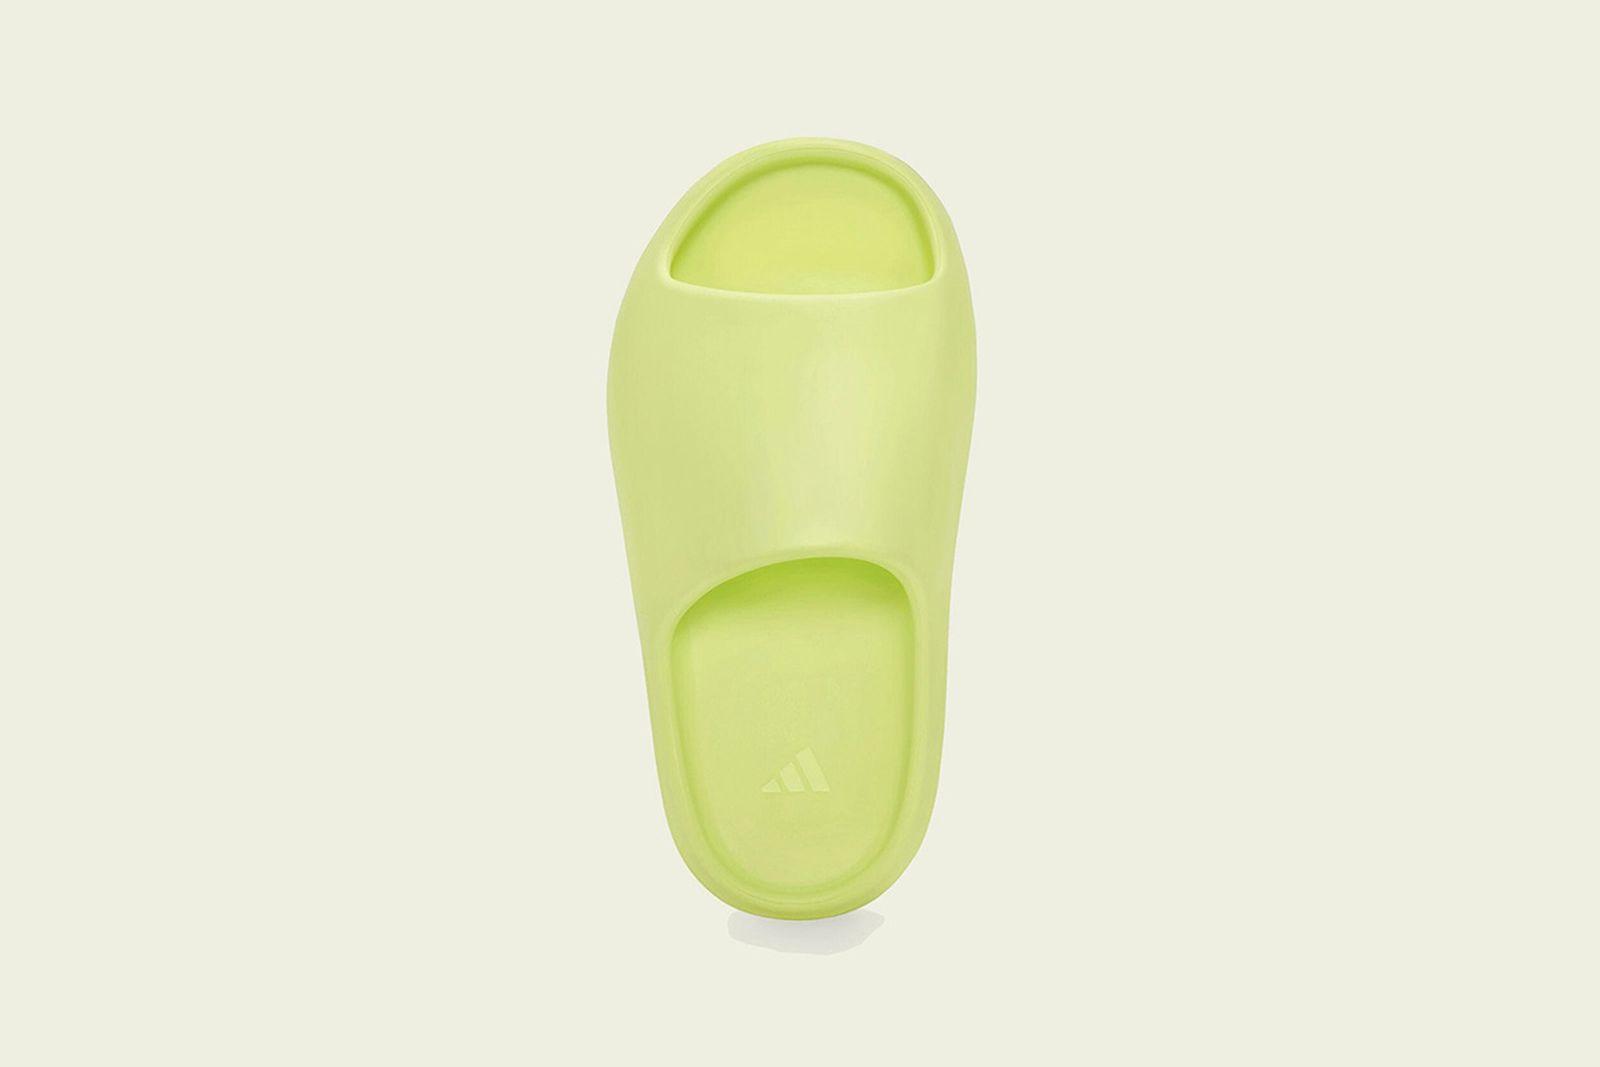 adidas-yeezy-slide-green-glow-release-date-info-price-06